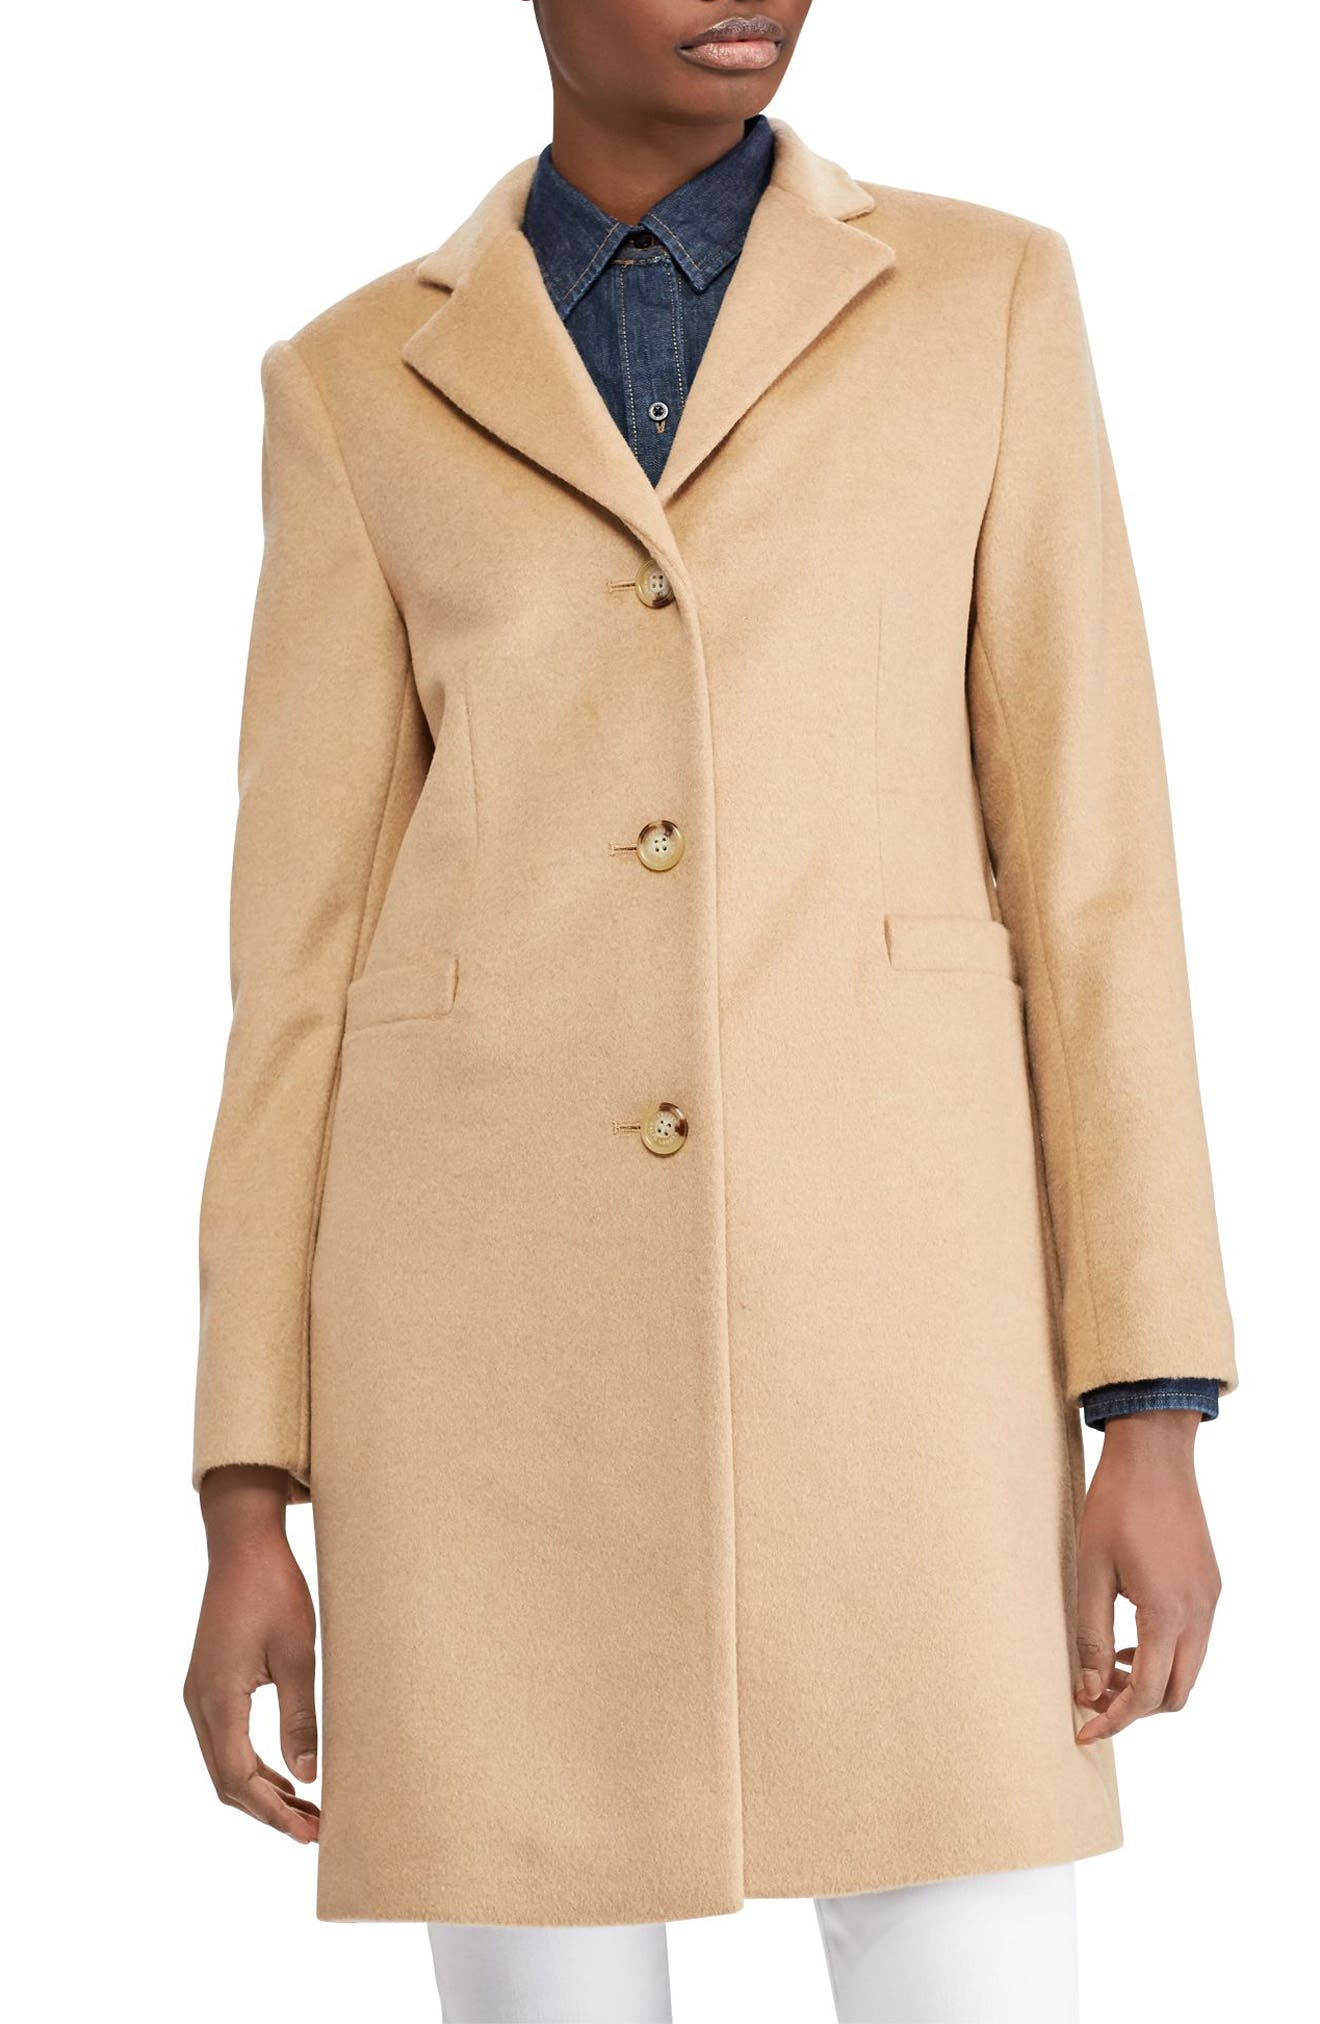 1940s Coats & Jackets Fashion History Womens Lauren Ralph Lauren Paige Wool Blend Reefer Coat Size 0 - Beige $220.00 AT vintagedancer.com